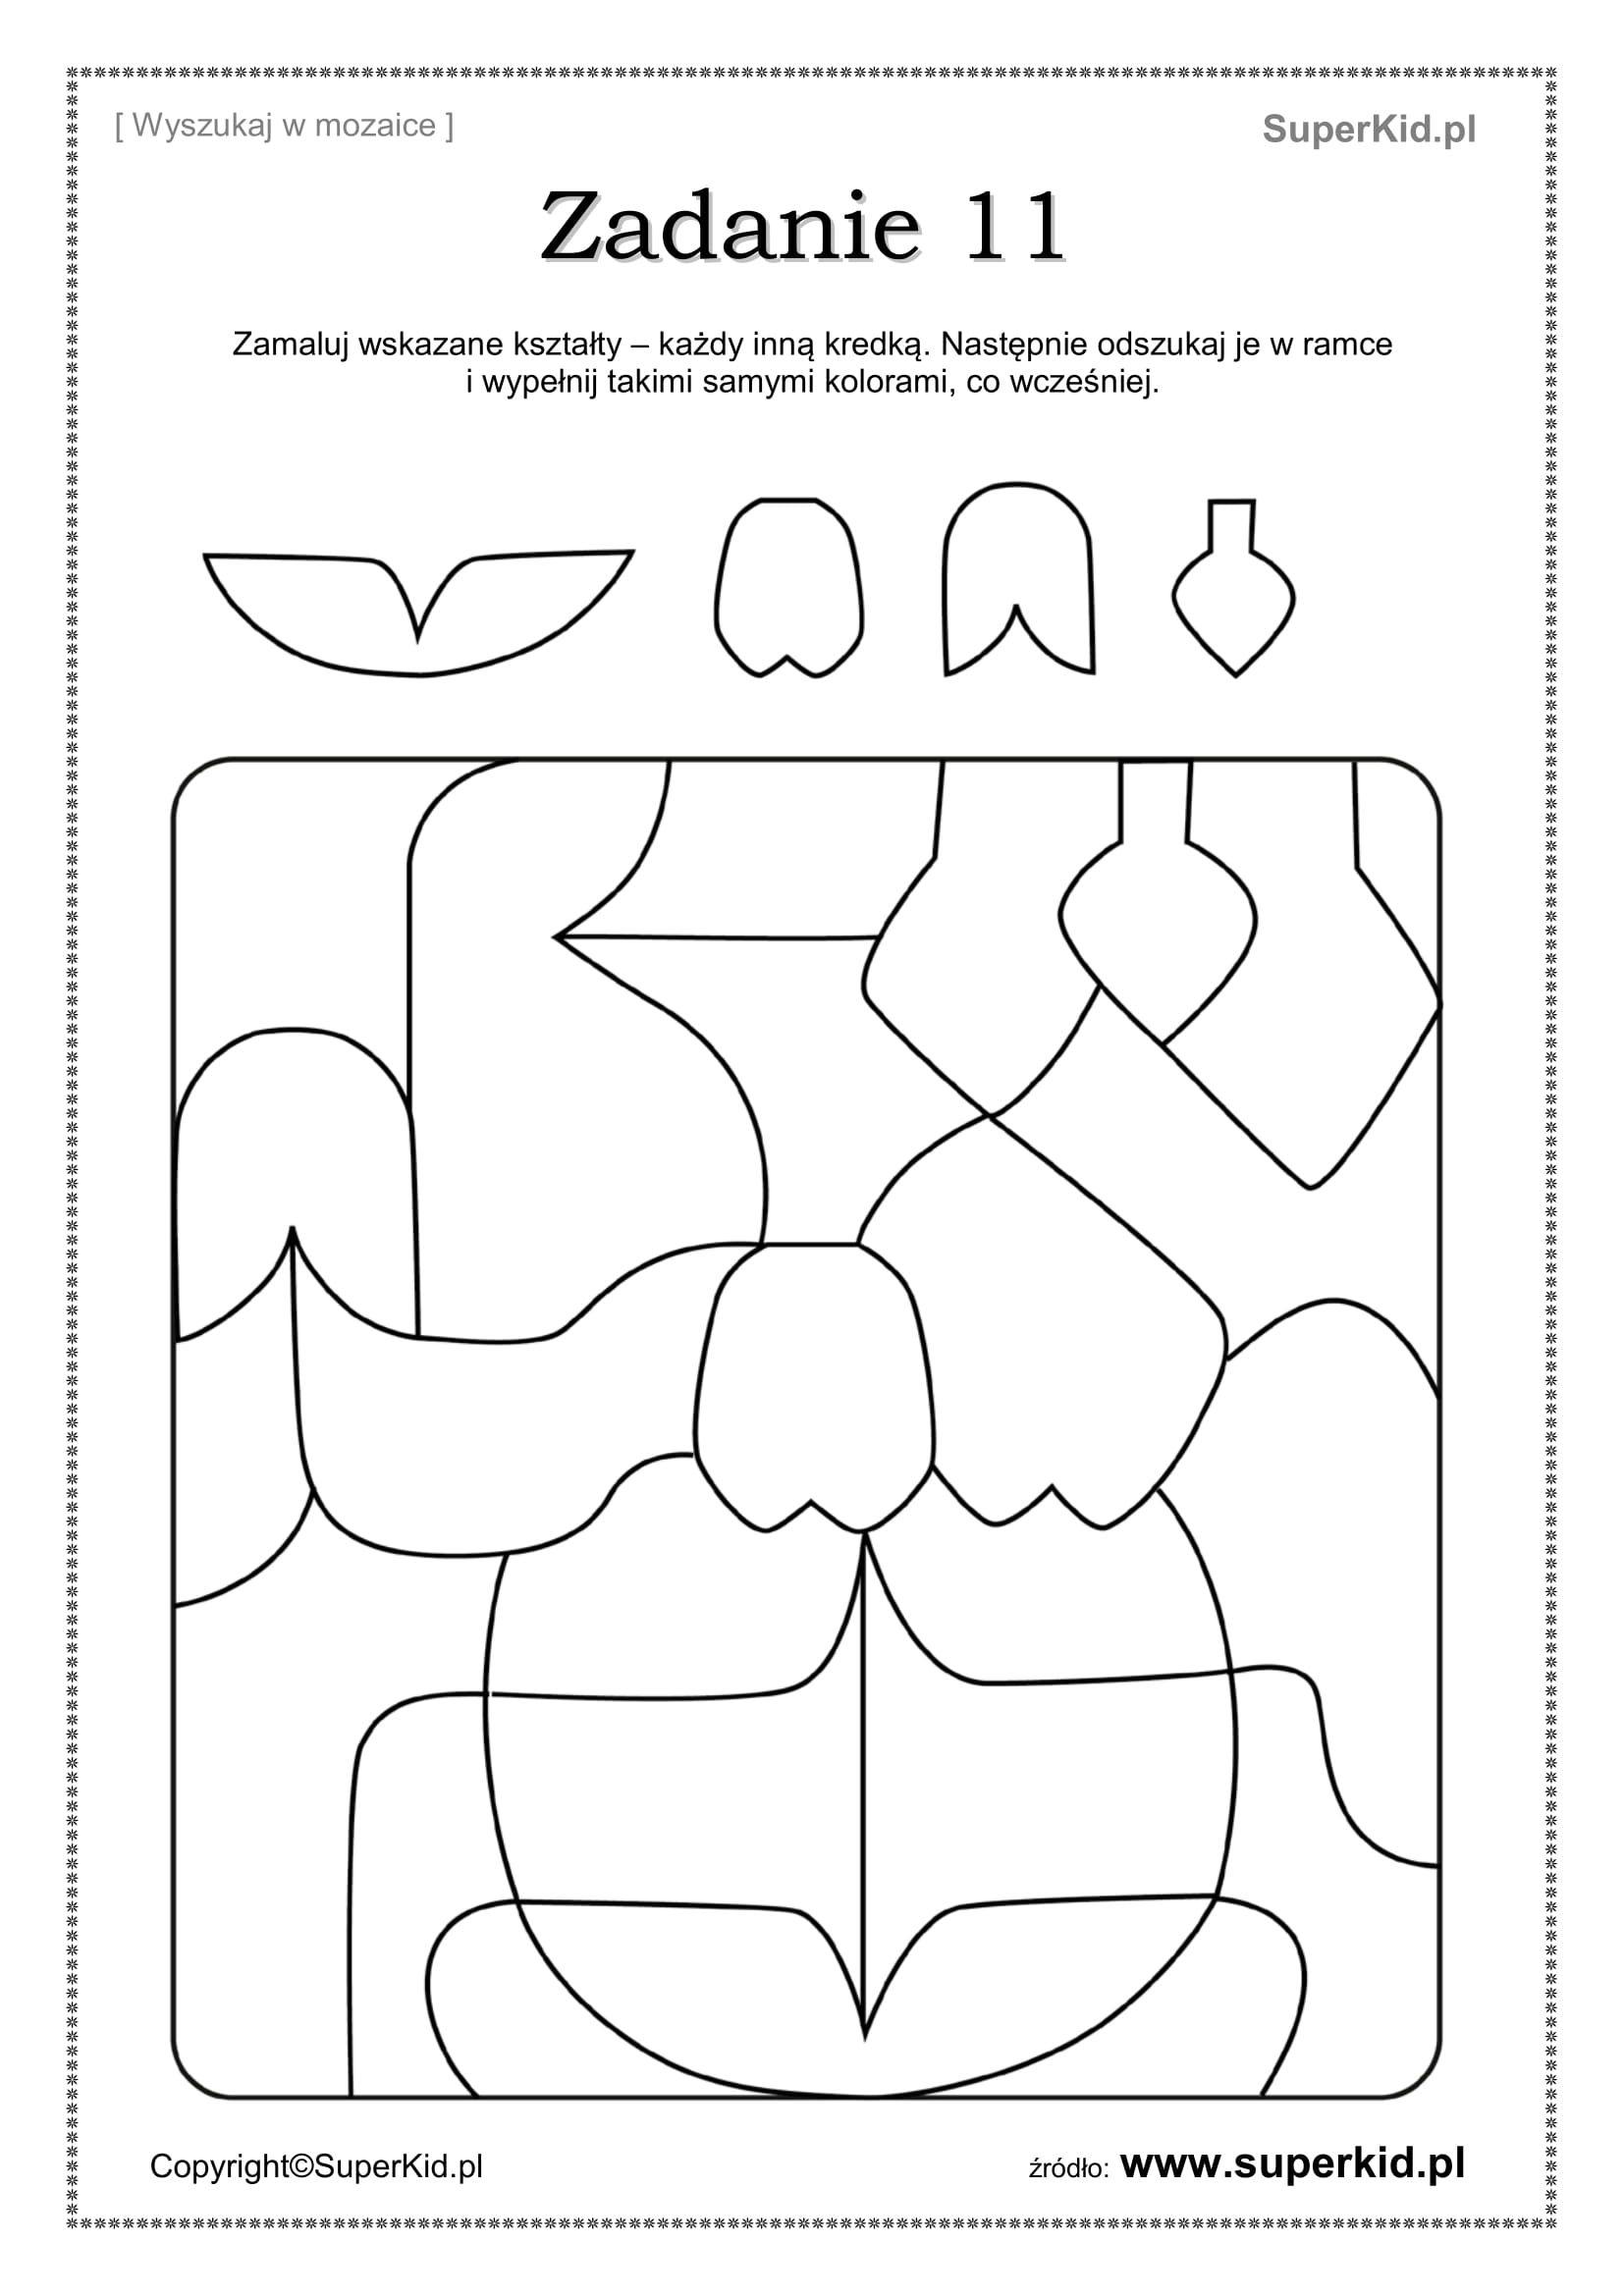 Pin By Gocha On Gocha In 2020 Visual Perceptual Activities Kids And Parenting Printables Kids